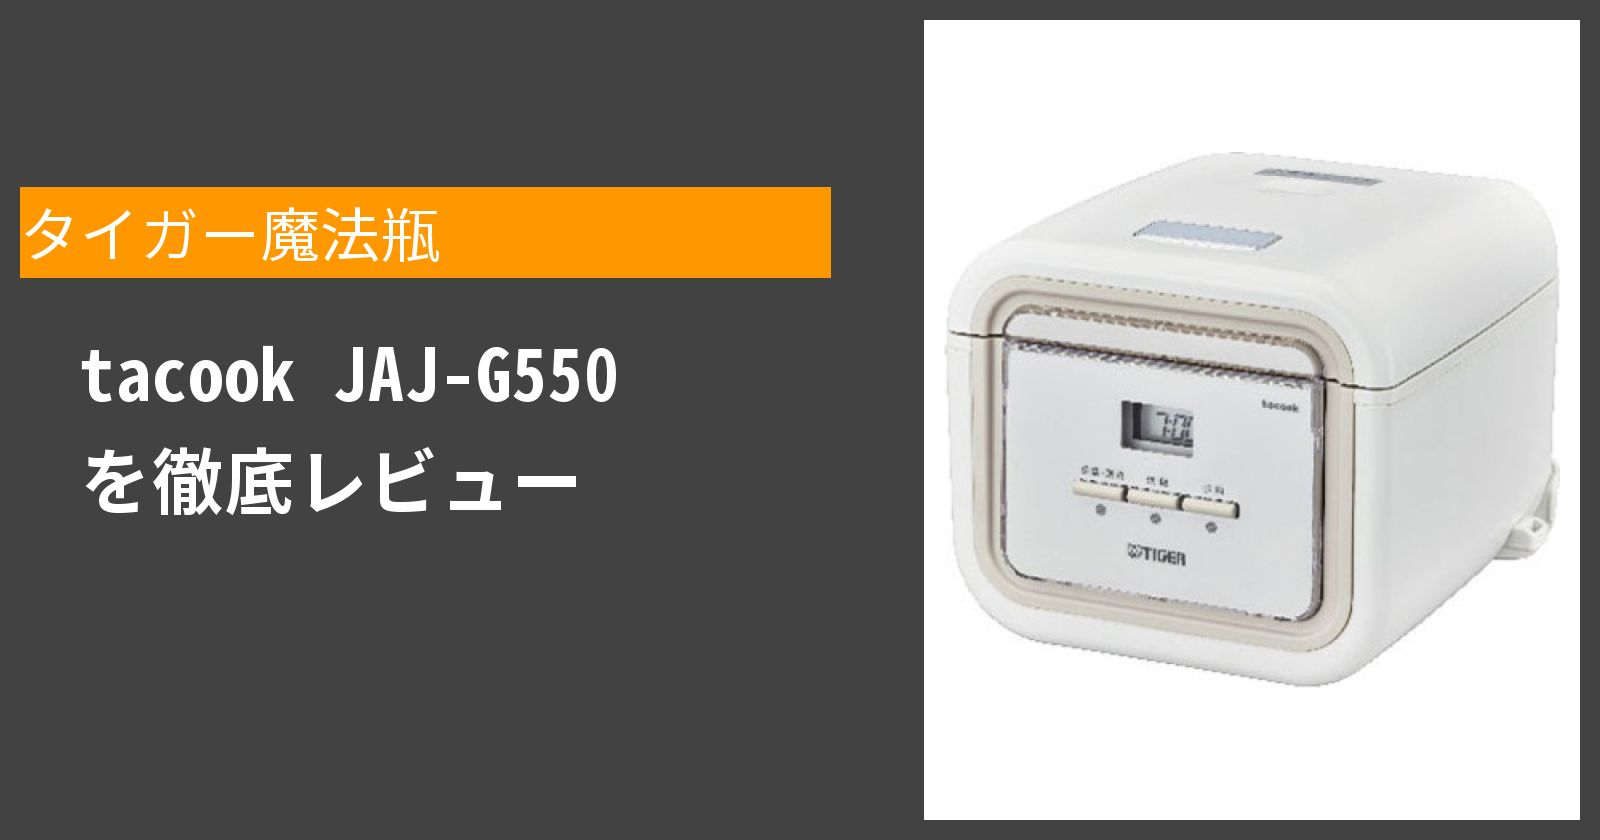 tacook JAJ-G550を徹底評価